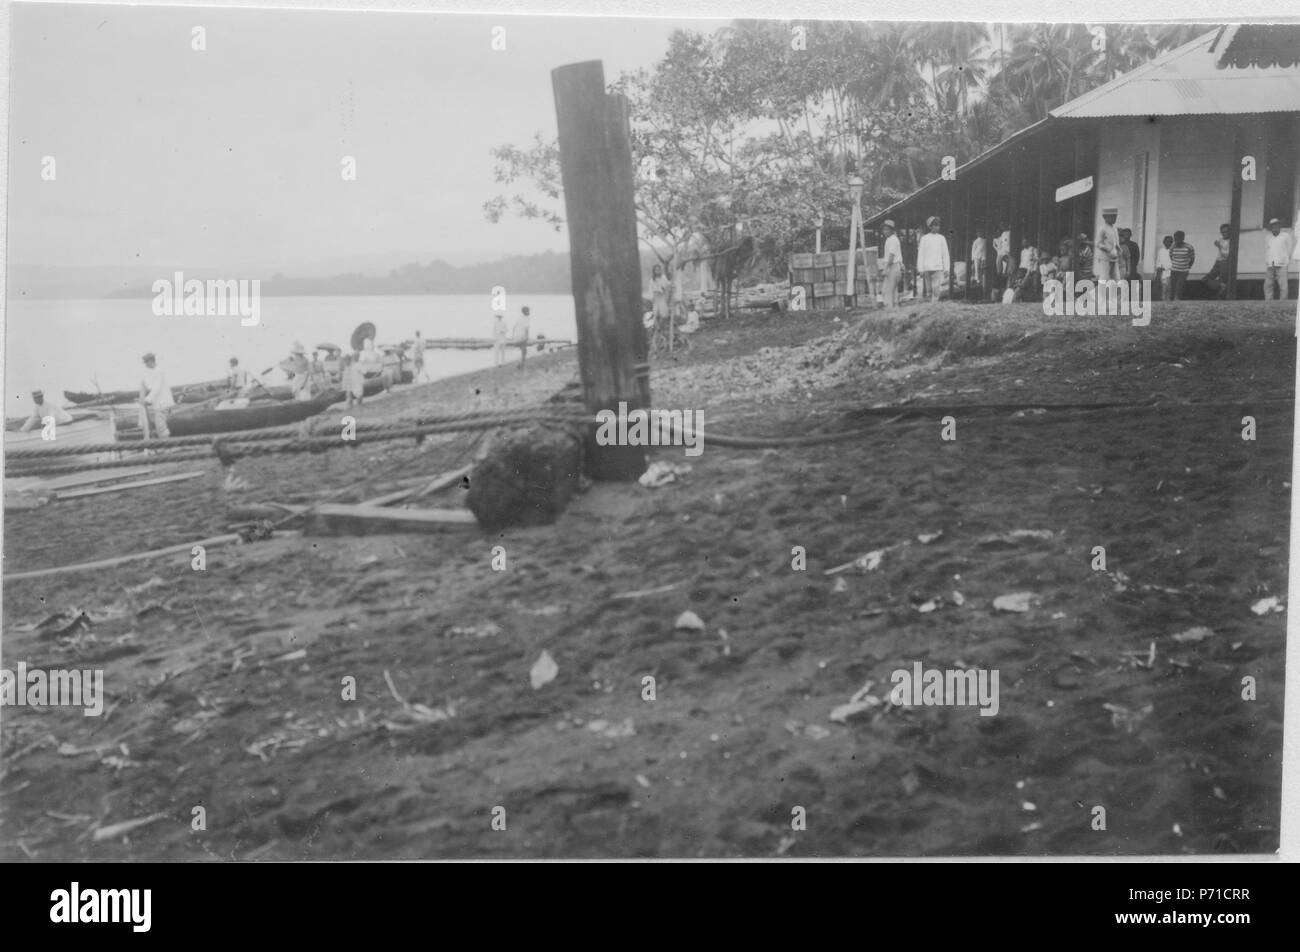 16 Hamnen. Sulawesi, Amurang. Indonesien - SMVK - 010669b - Stock Image